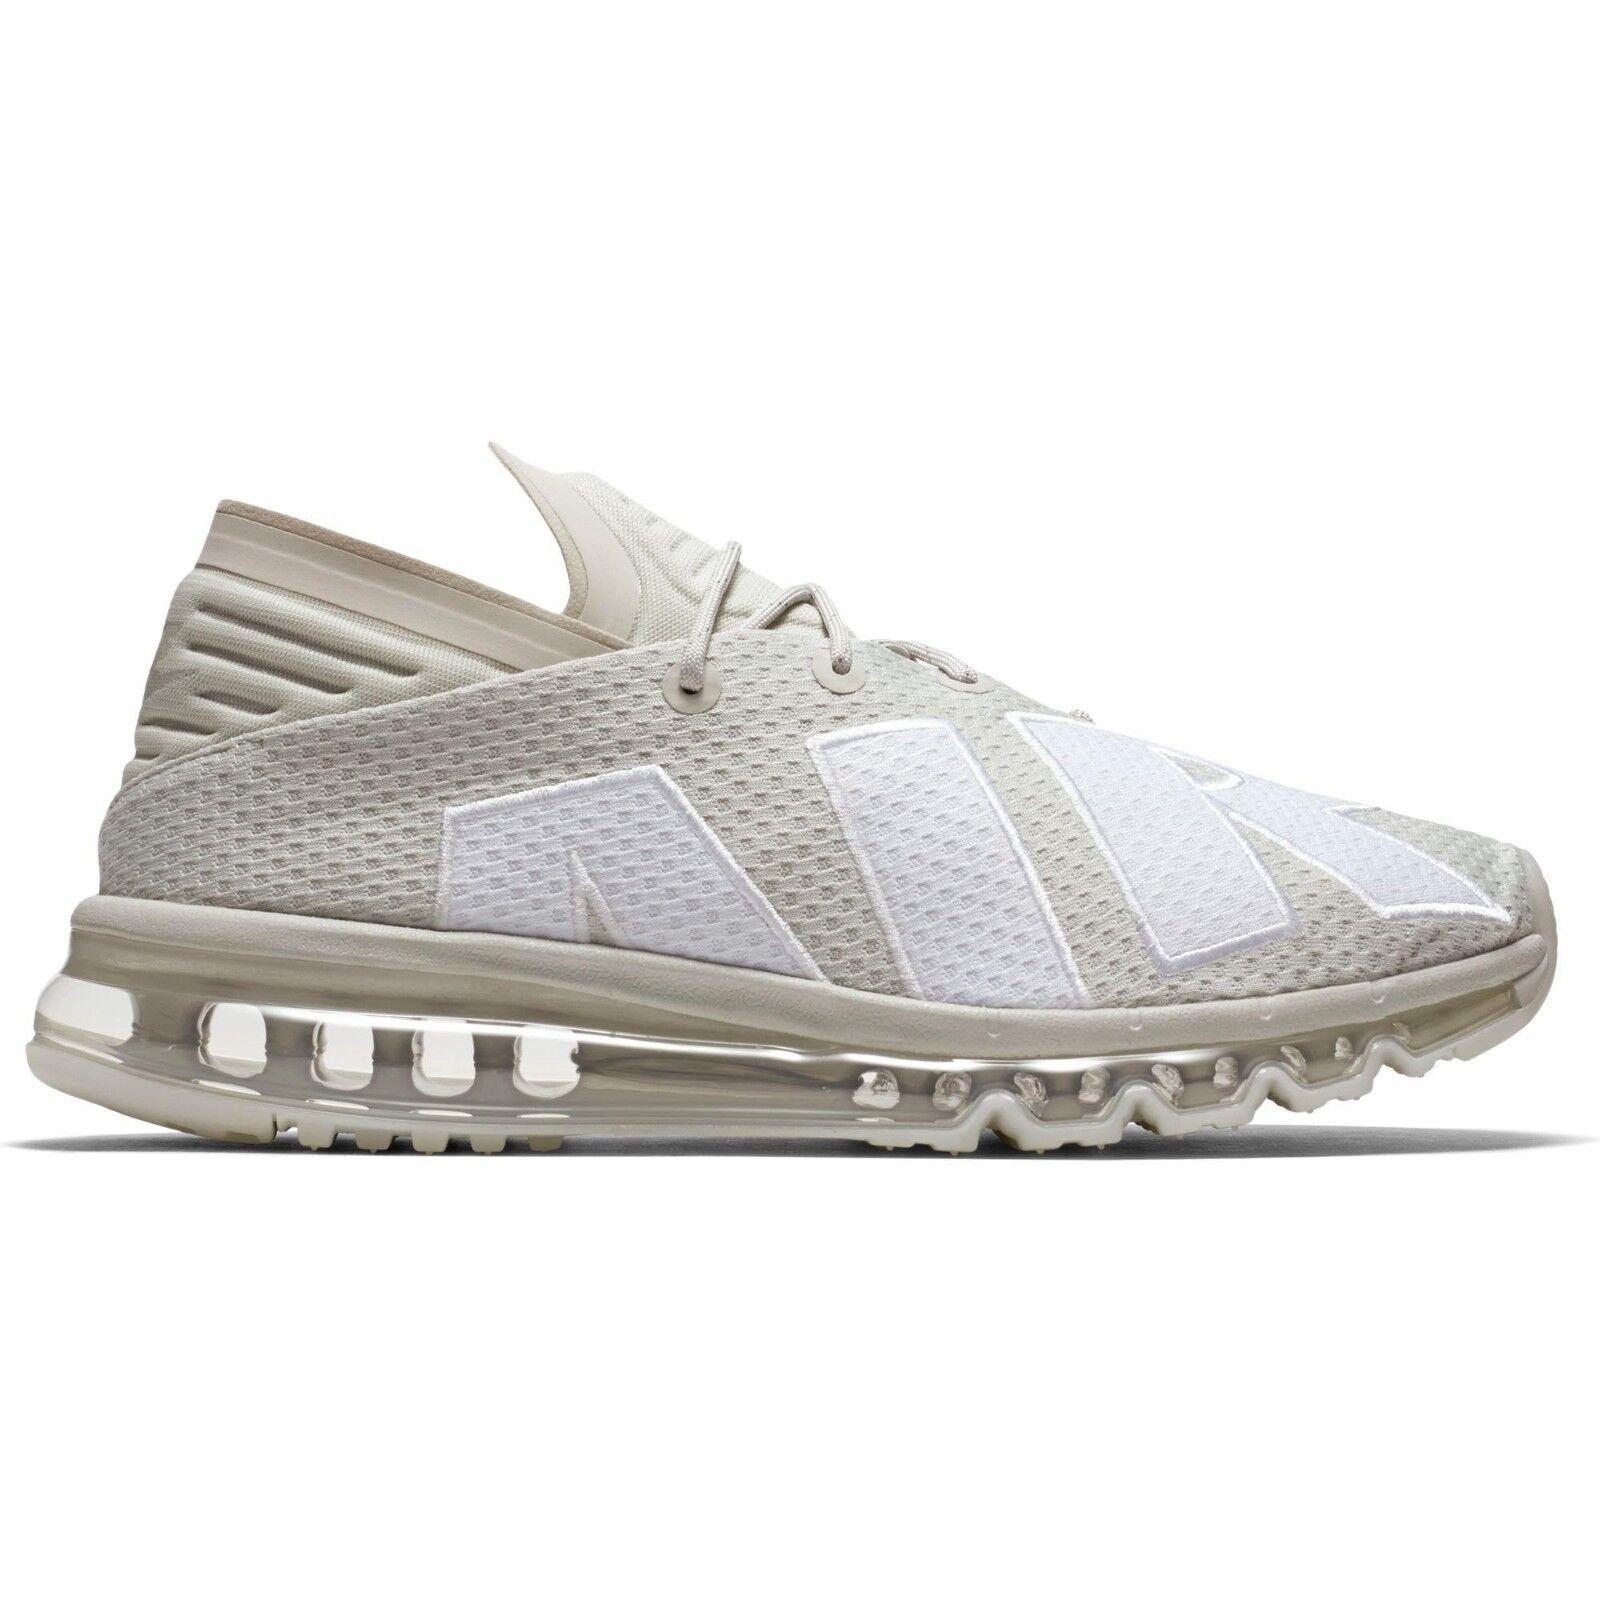 Men's Nike Air Max Flair Running Shoes, 942236 005 Sizes 9-13 Light Bone/White/G